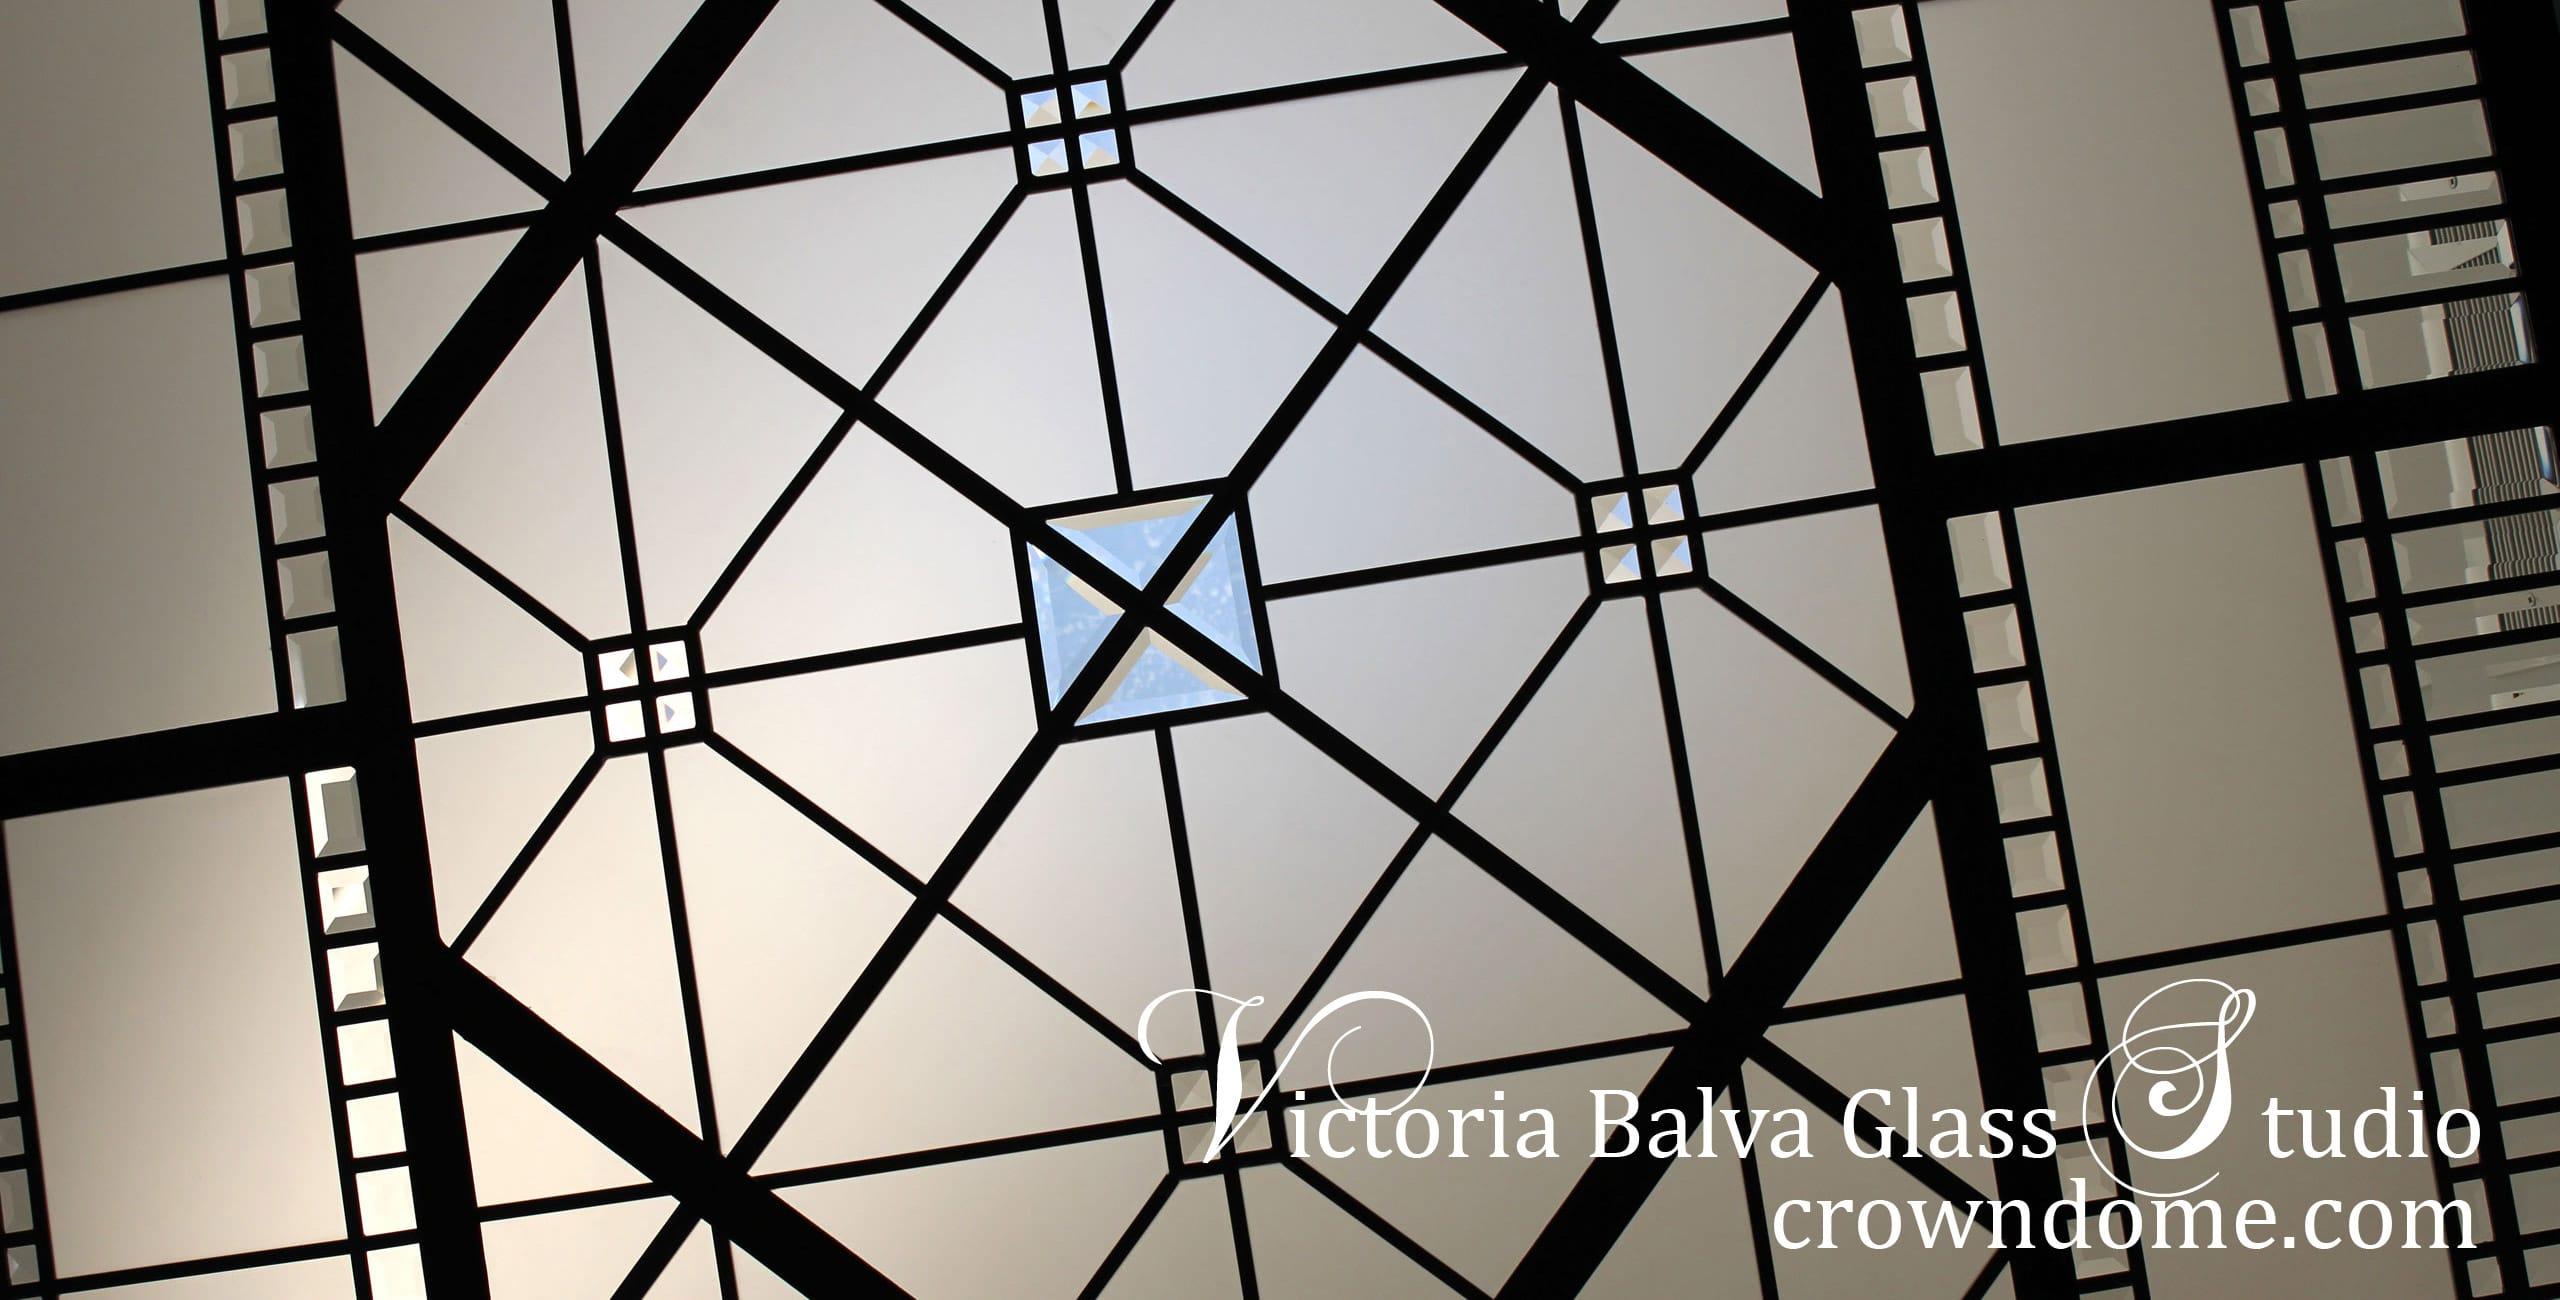 Small leaded glass skylight ceiling for a bathroom of a luxury custom-built residence in Toronto. Simple geometrical design inspired bythe historical leaded glass skylights of Great BritainCastles.Leaded glass skylight design by stained glass artist Victoria Balva